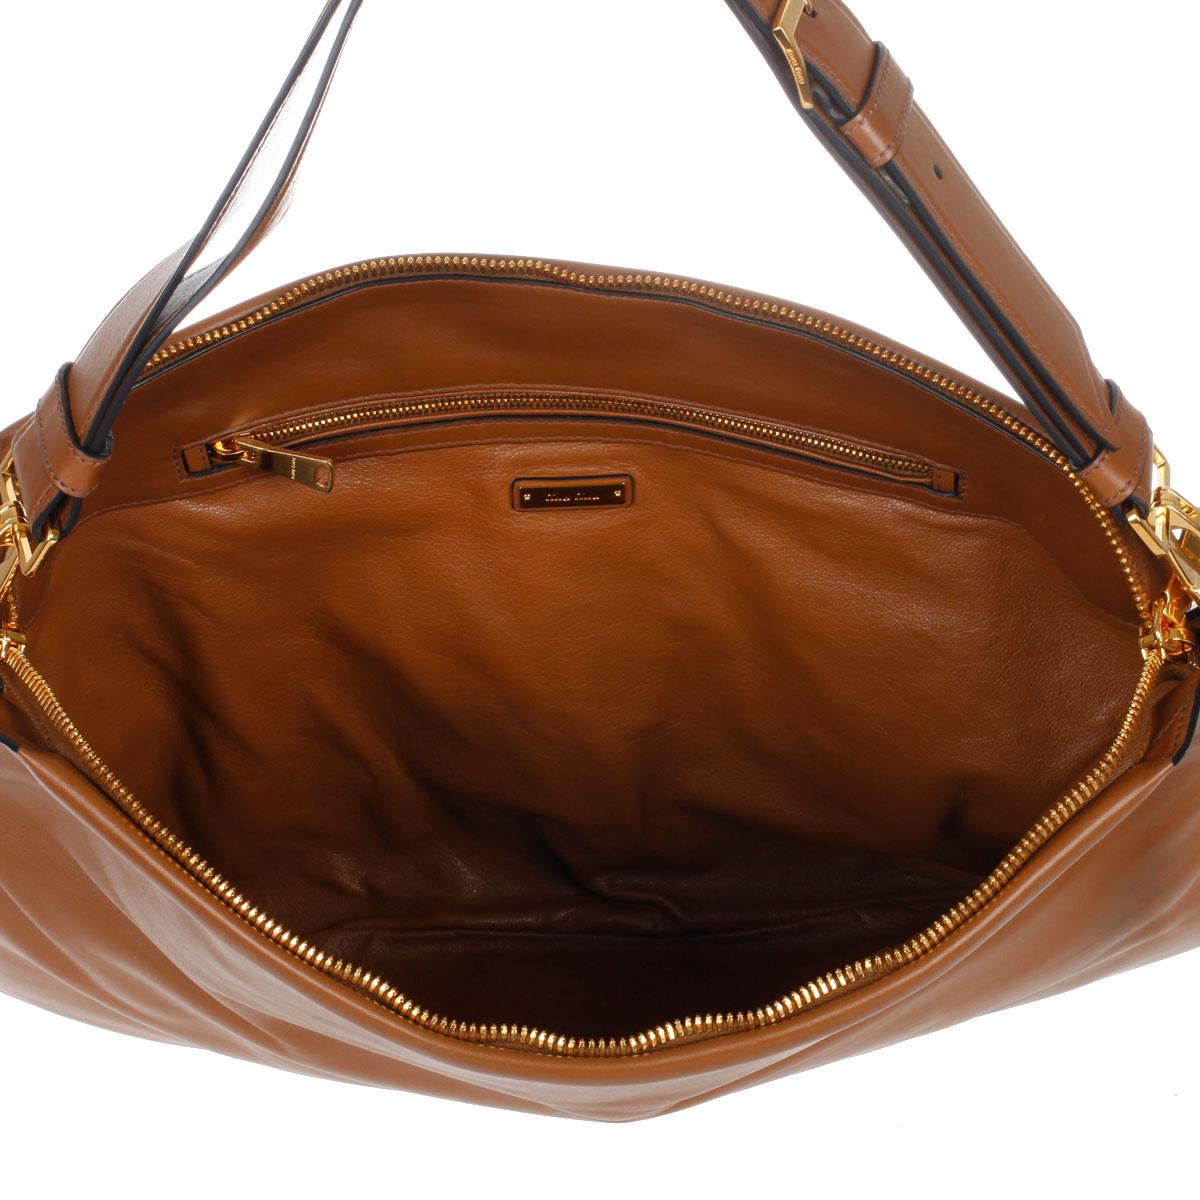 Borse A Spalla Miu Miu : Miu women leather shoulder bag spence outlet